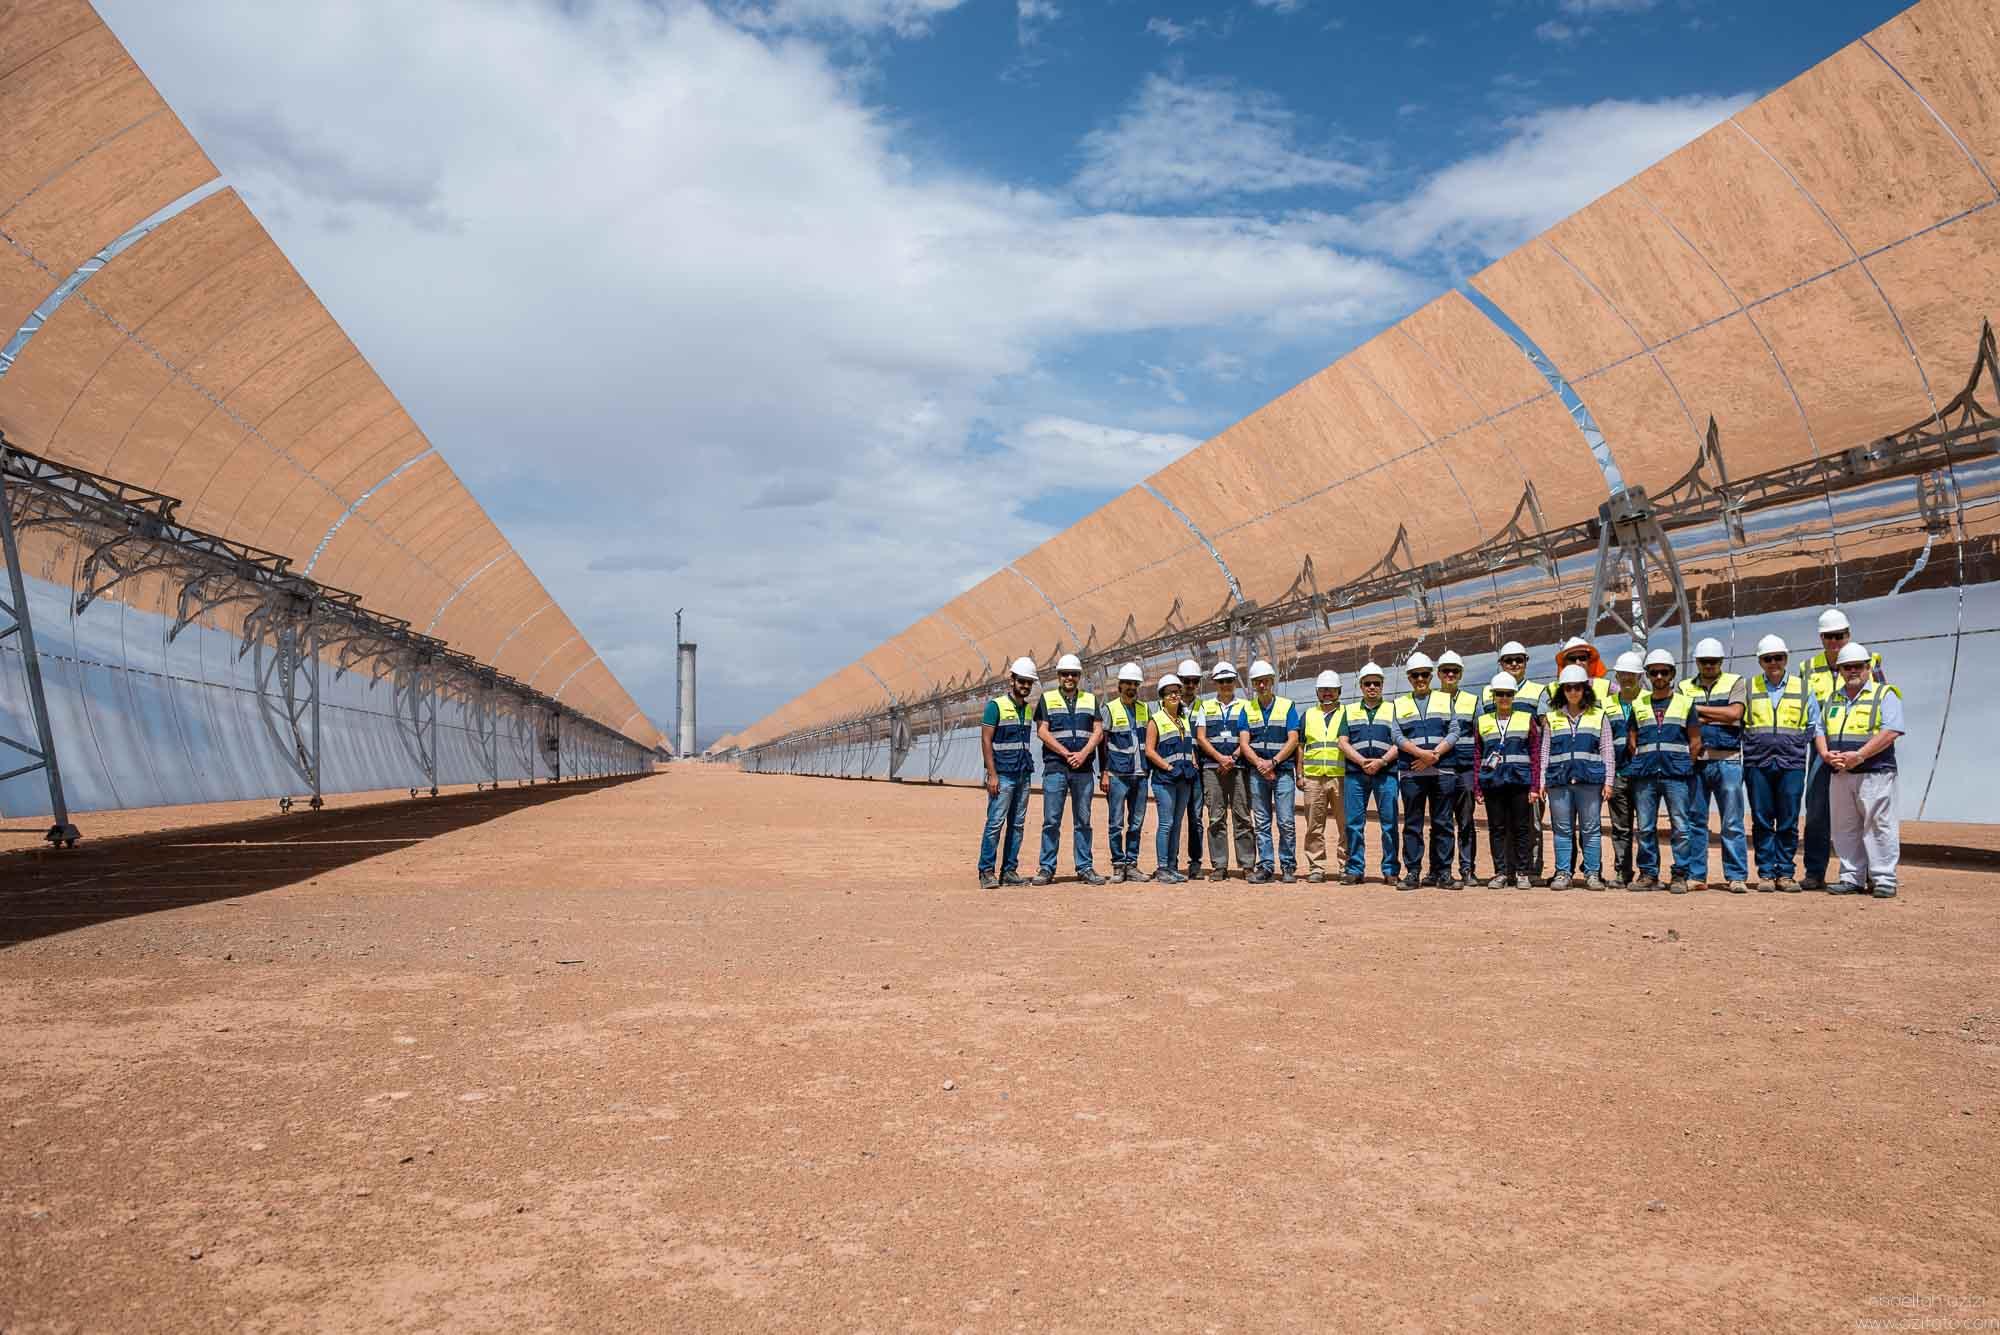 Mohammad Abunayyan Chairman of ACWA Power vistitng Ouarzazate Solar Power Station